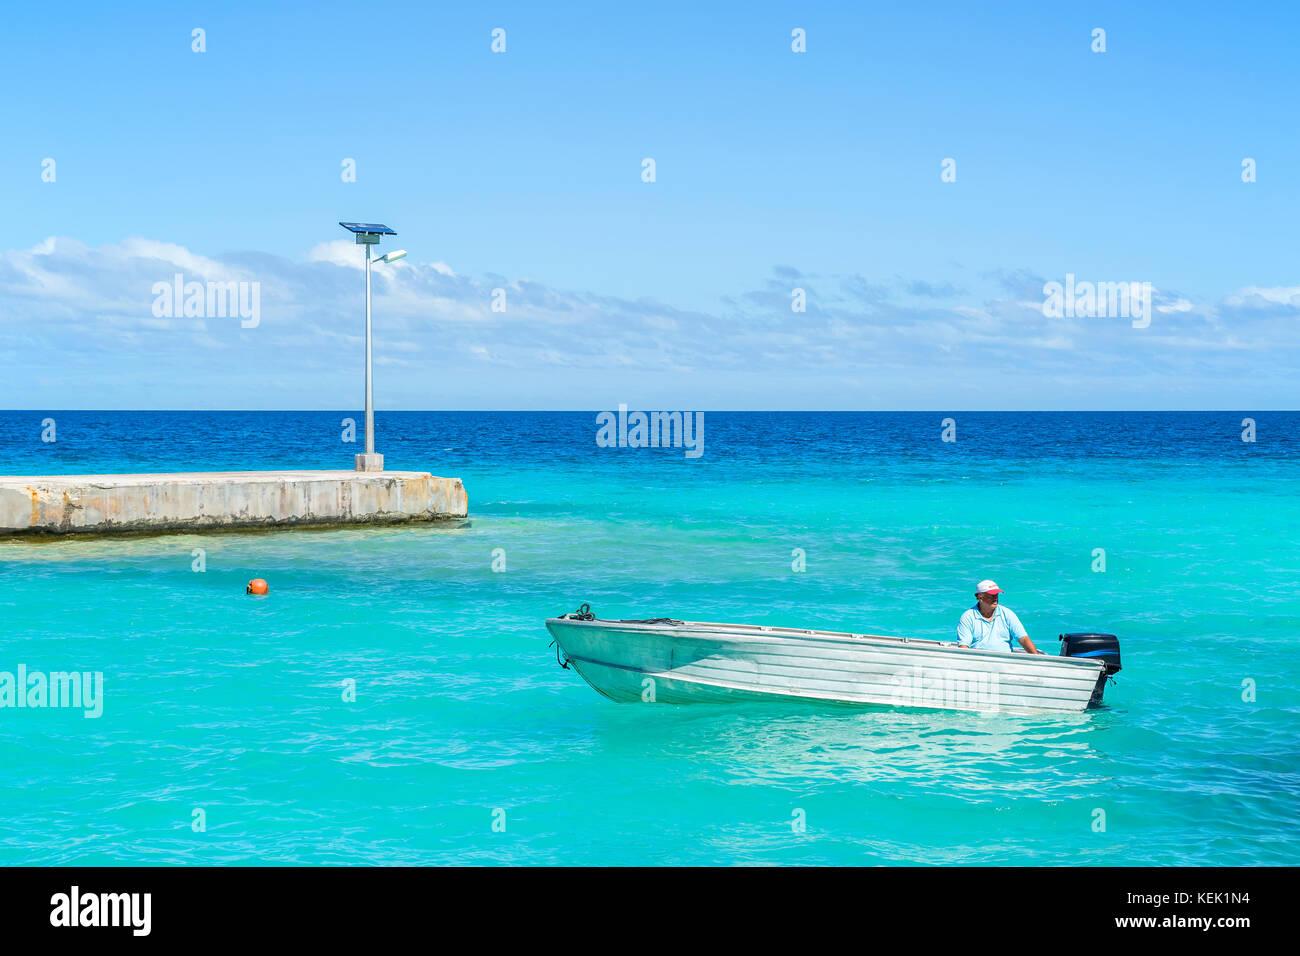 Small motorboat at sea in Rangiroa, French Polynesia - Stock Image